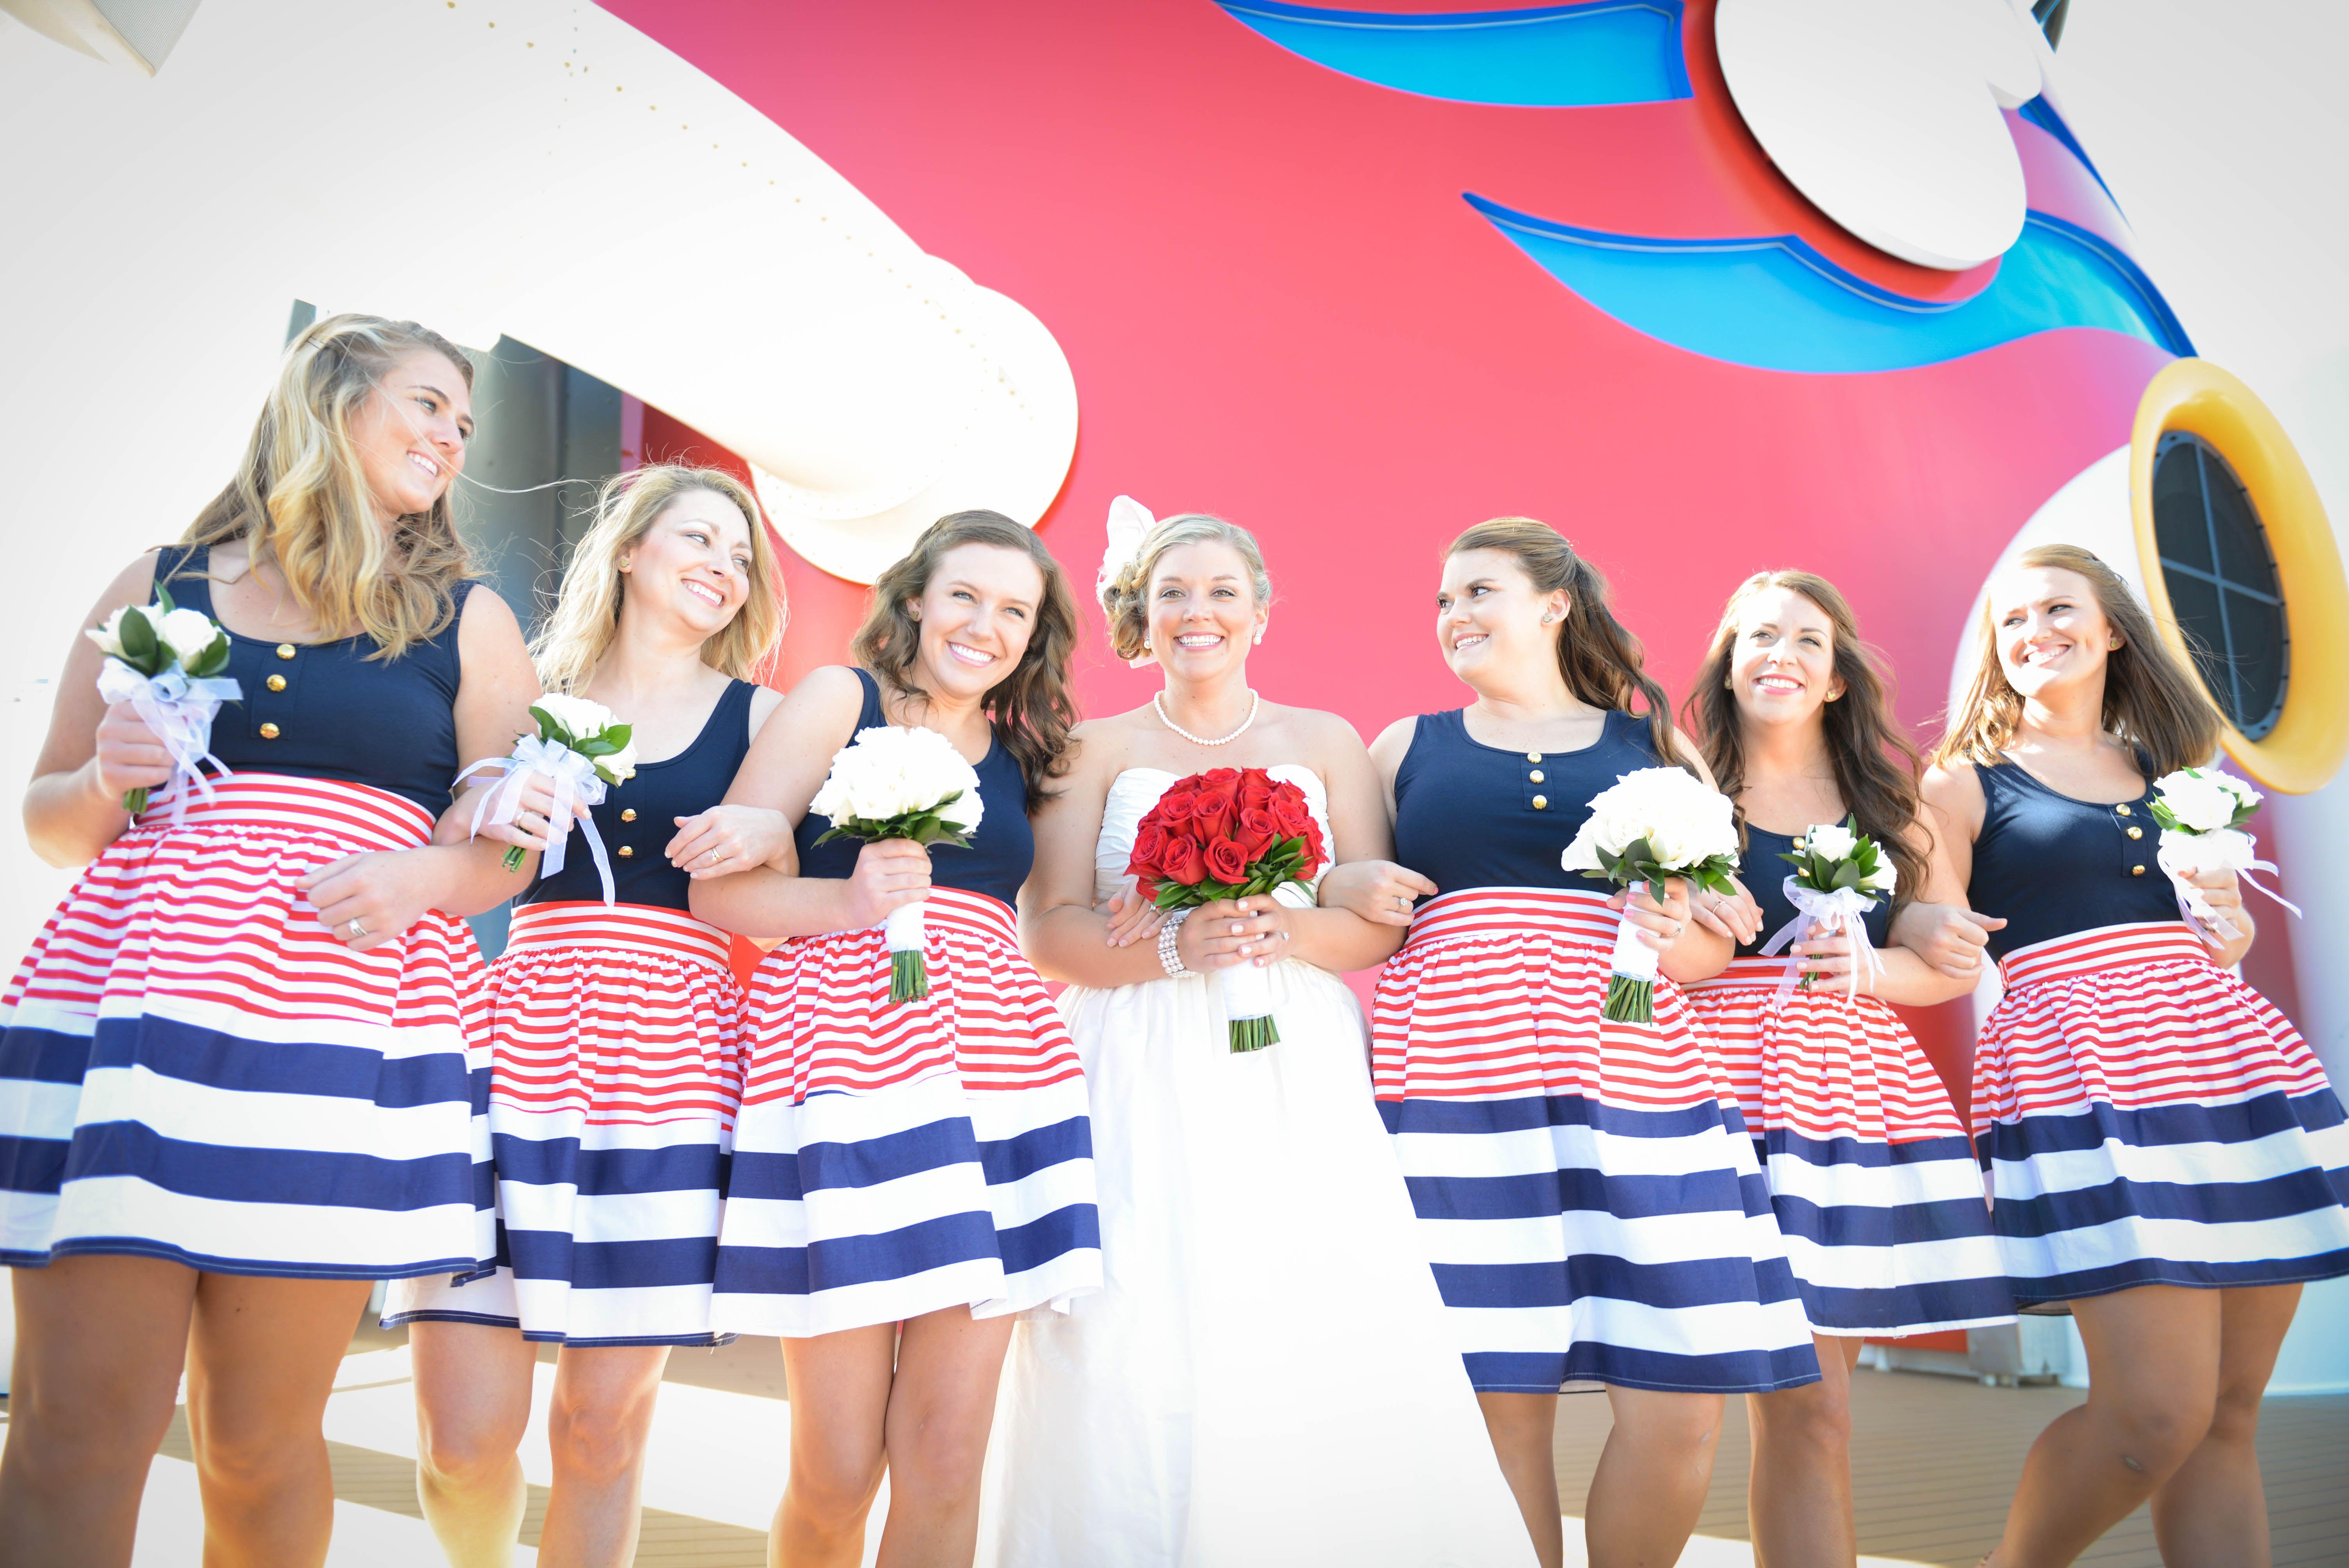 Pin by Hayley Snowden on Wedding cruise | Pinterest